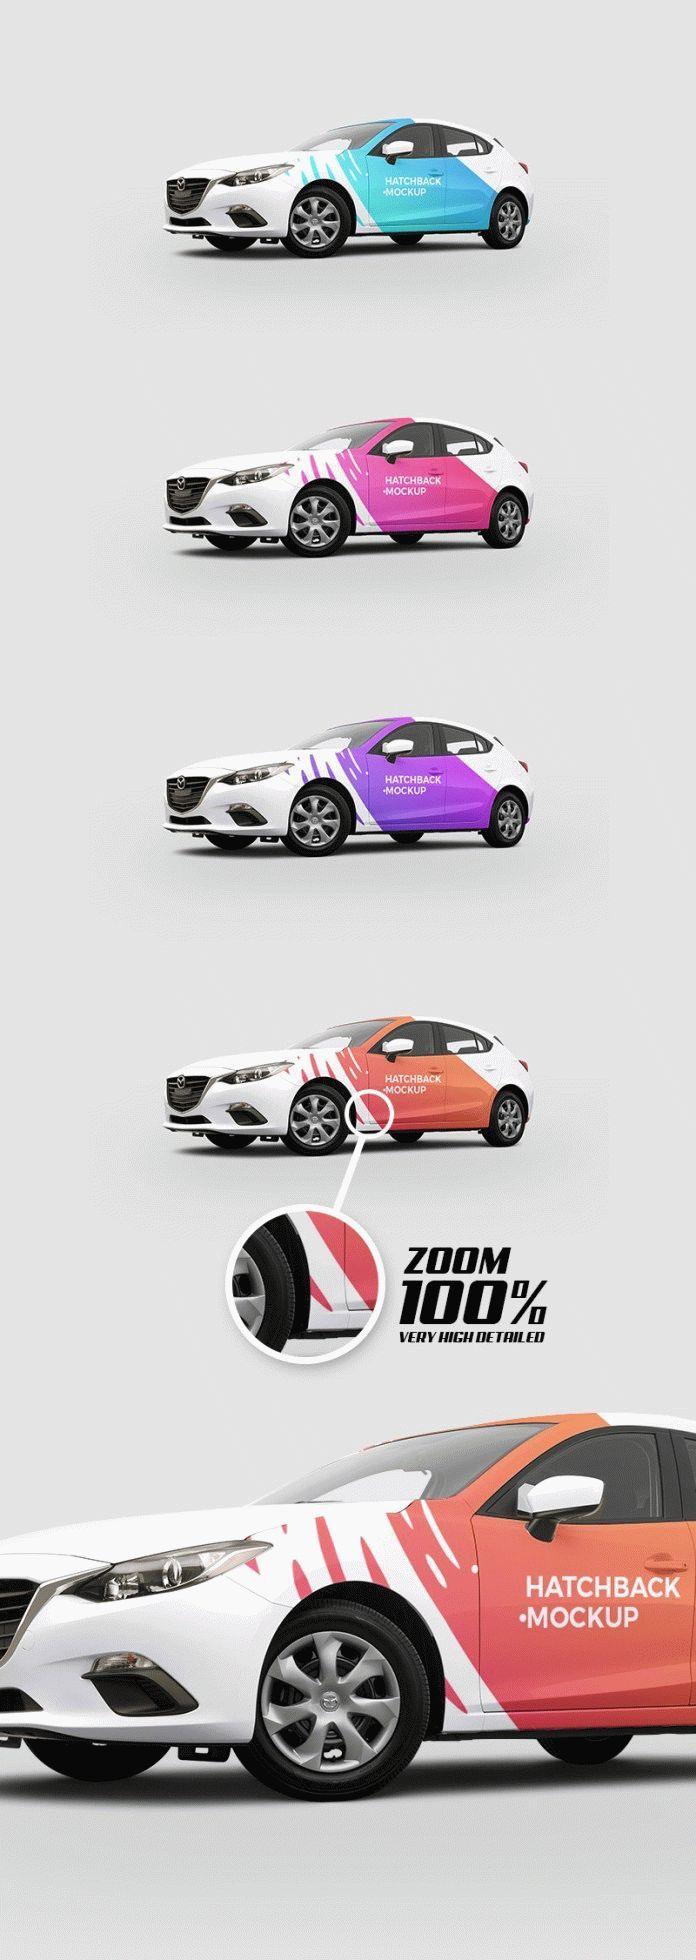 Free Hatchback Car Mockup Psd Mockupfree Co Car Sticker Design Mockup Free Psd Car Wrap Design